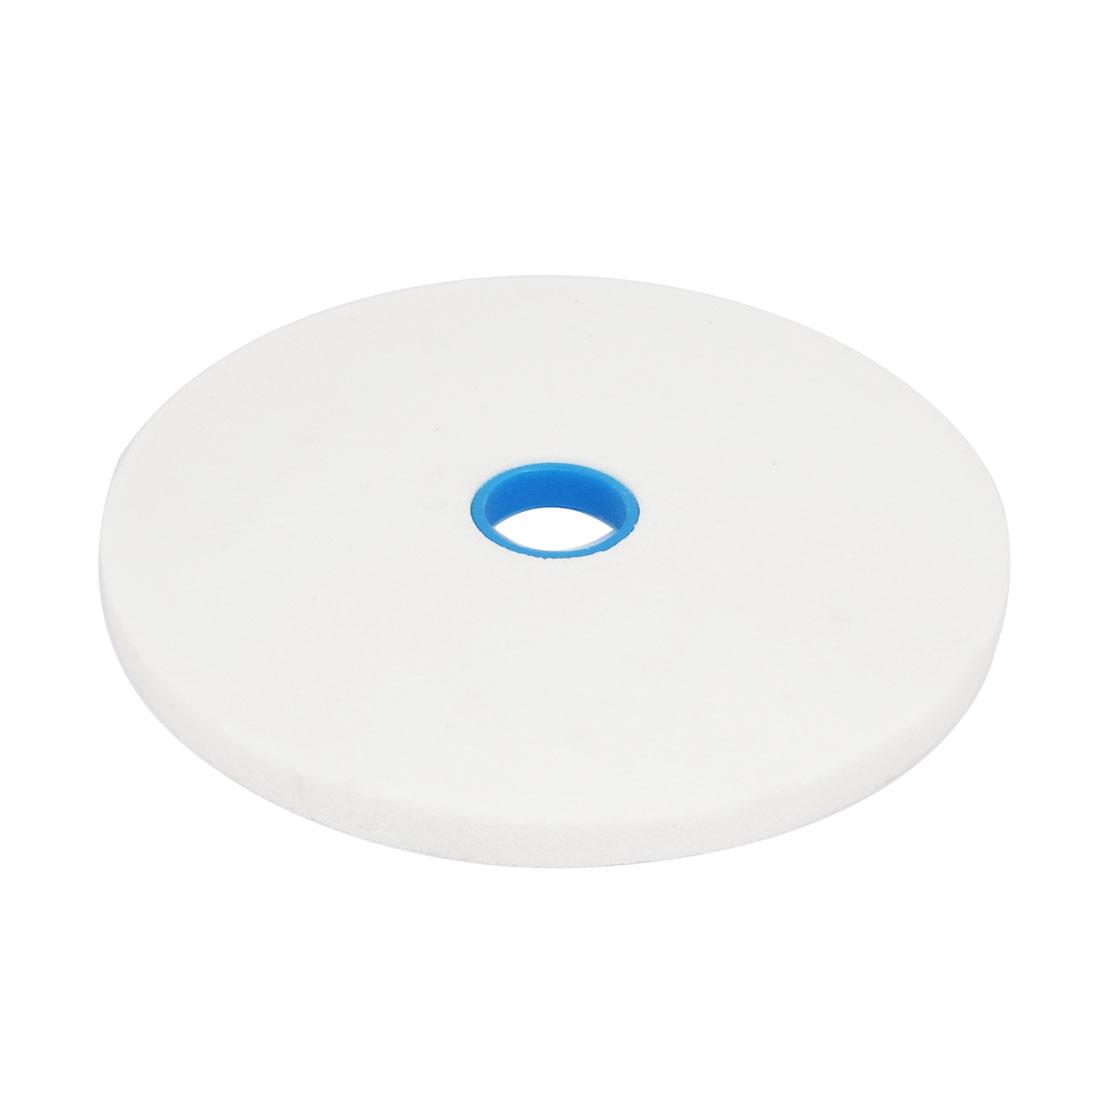 Round Abrasives Grinding Wheel Hardware White 20 x 1.3 x 3.2cm